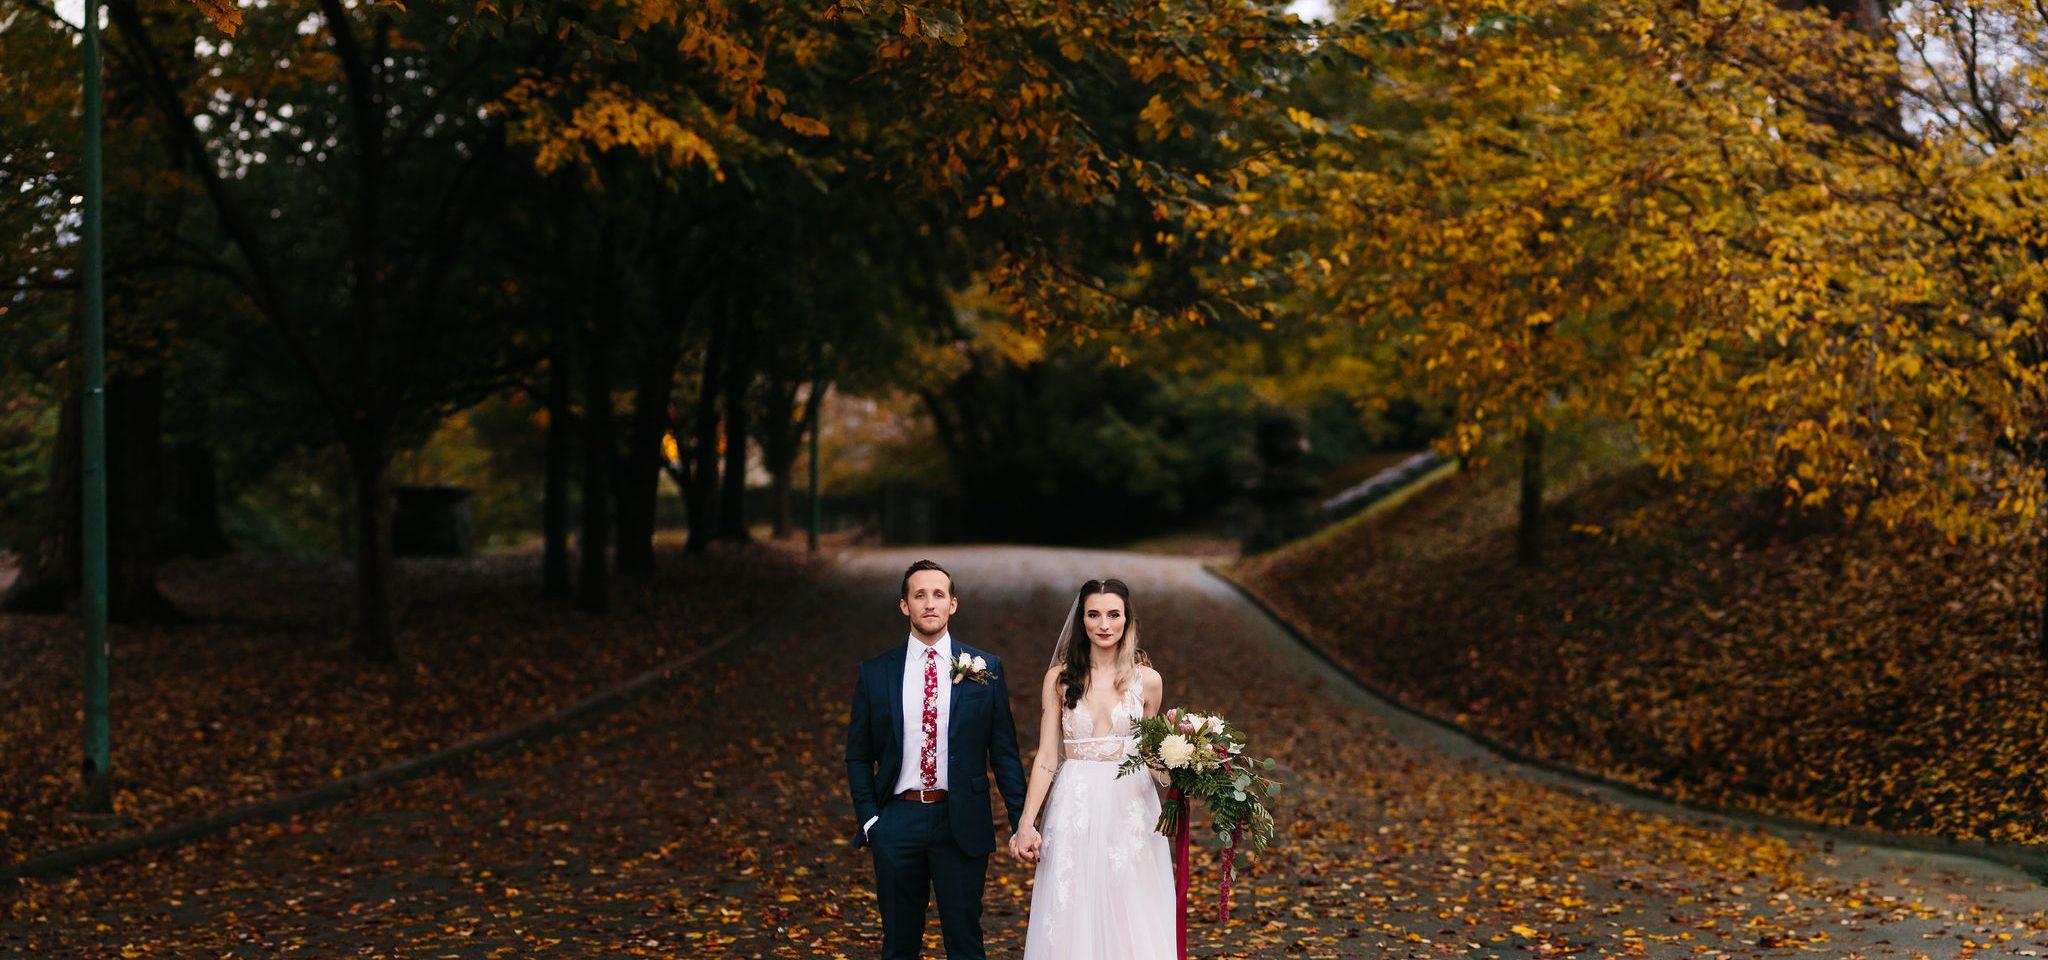 fall wedding photos bride and groom dramatic edgy